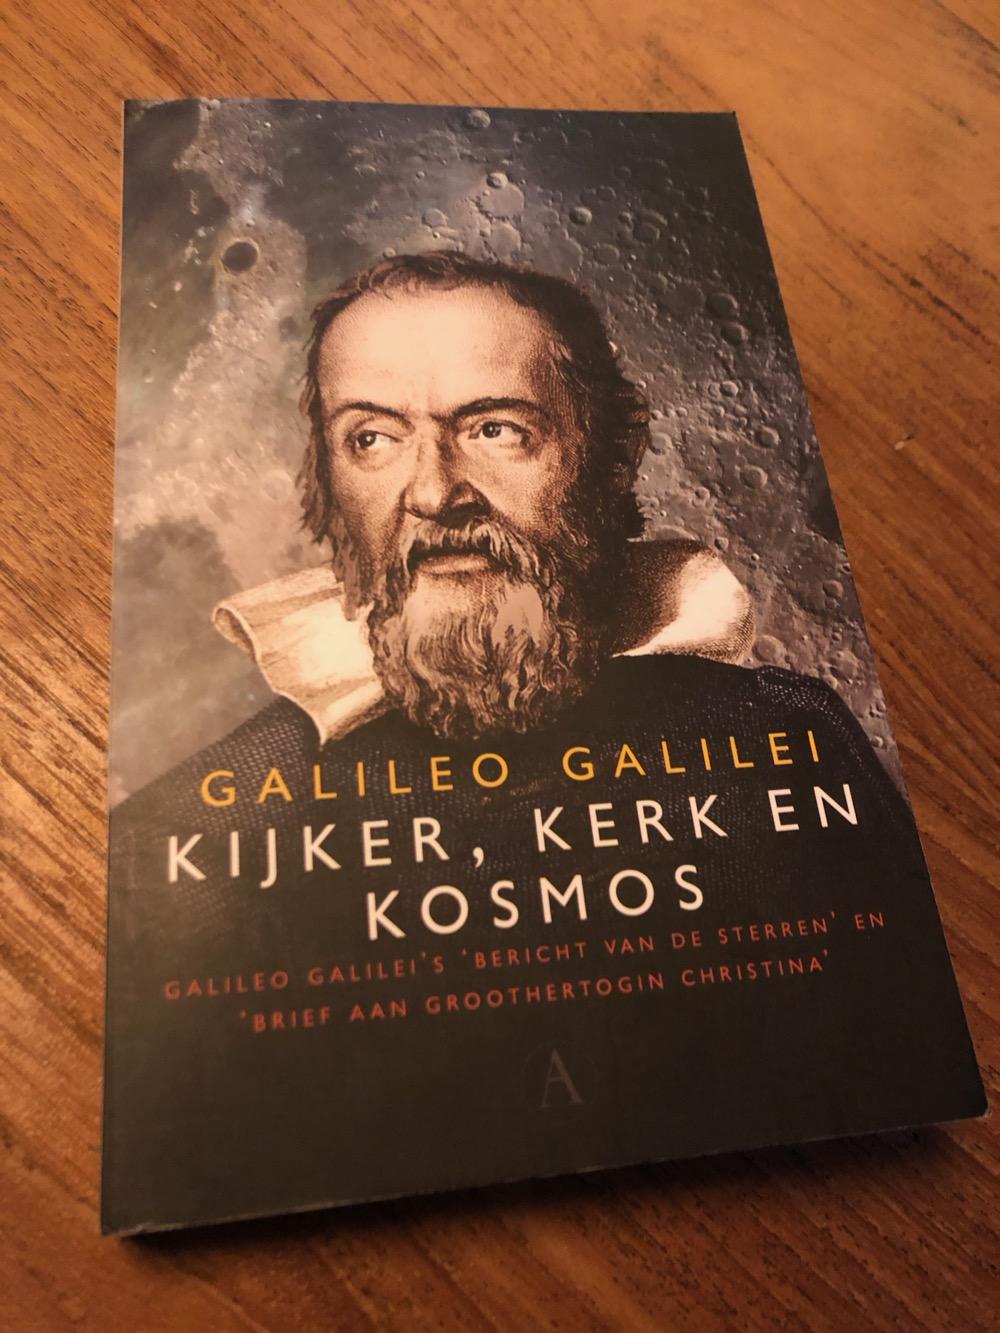 Galileo Galilei; Kijker, Kerk en Kosmos, 2017 – Boekverslag